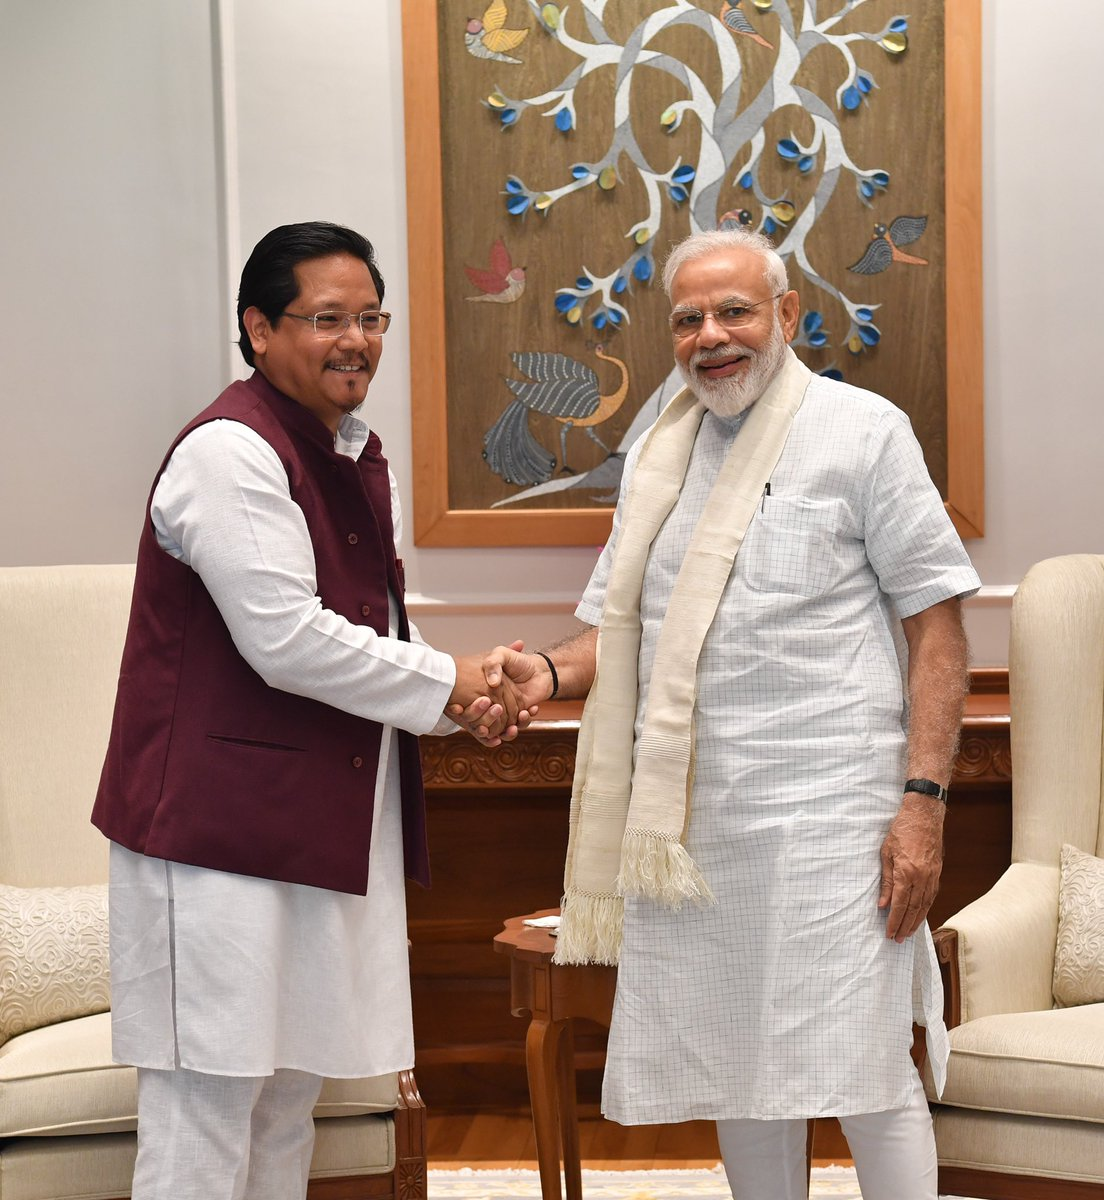 Shri @SangmaConrad, the CM of Meghalaya met PM @narendramodi. https://t.co/kcdP1rP9ZH